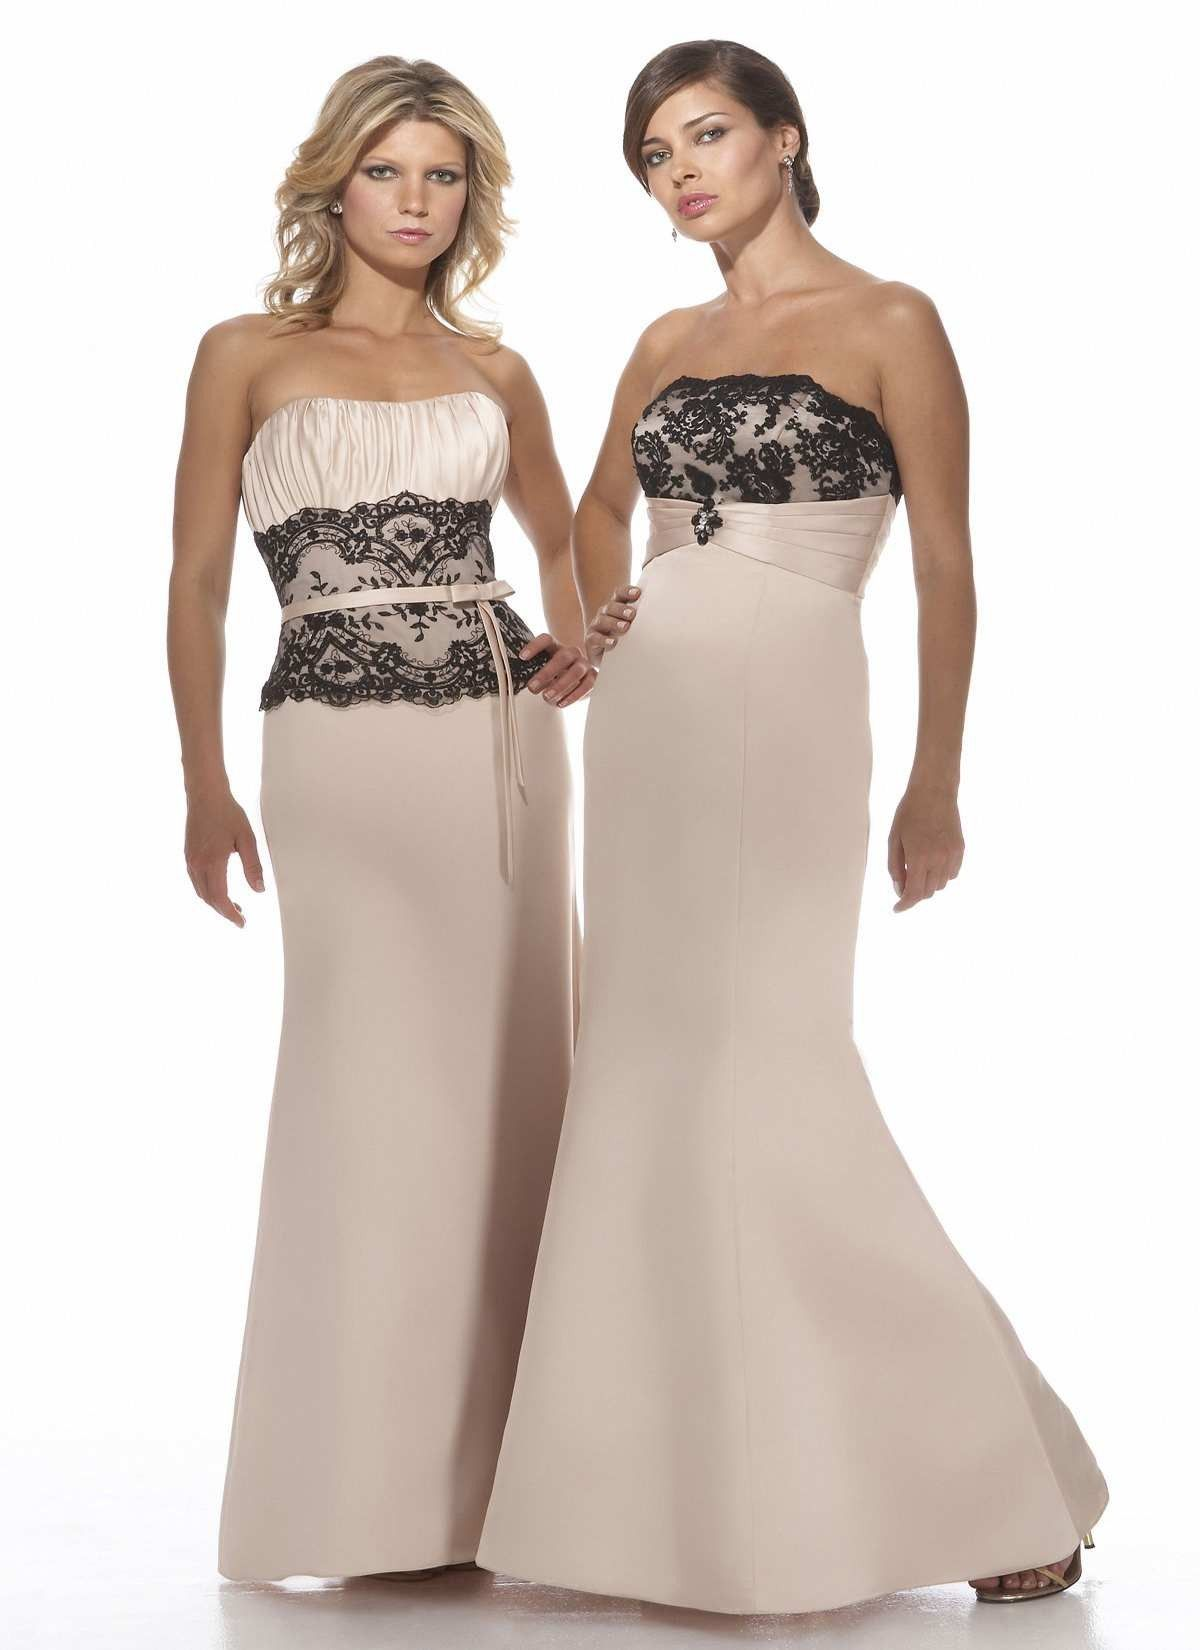 Black lace bridesmaid dresses australia